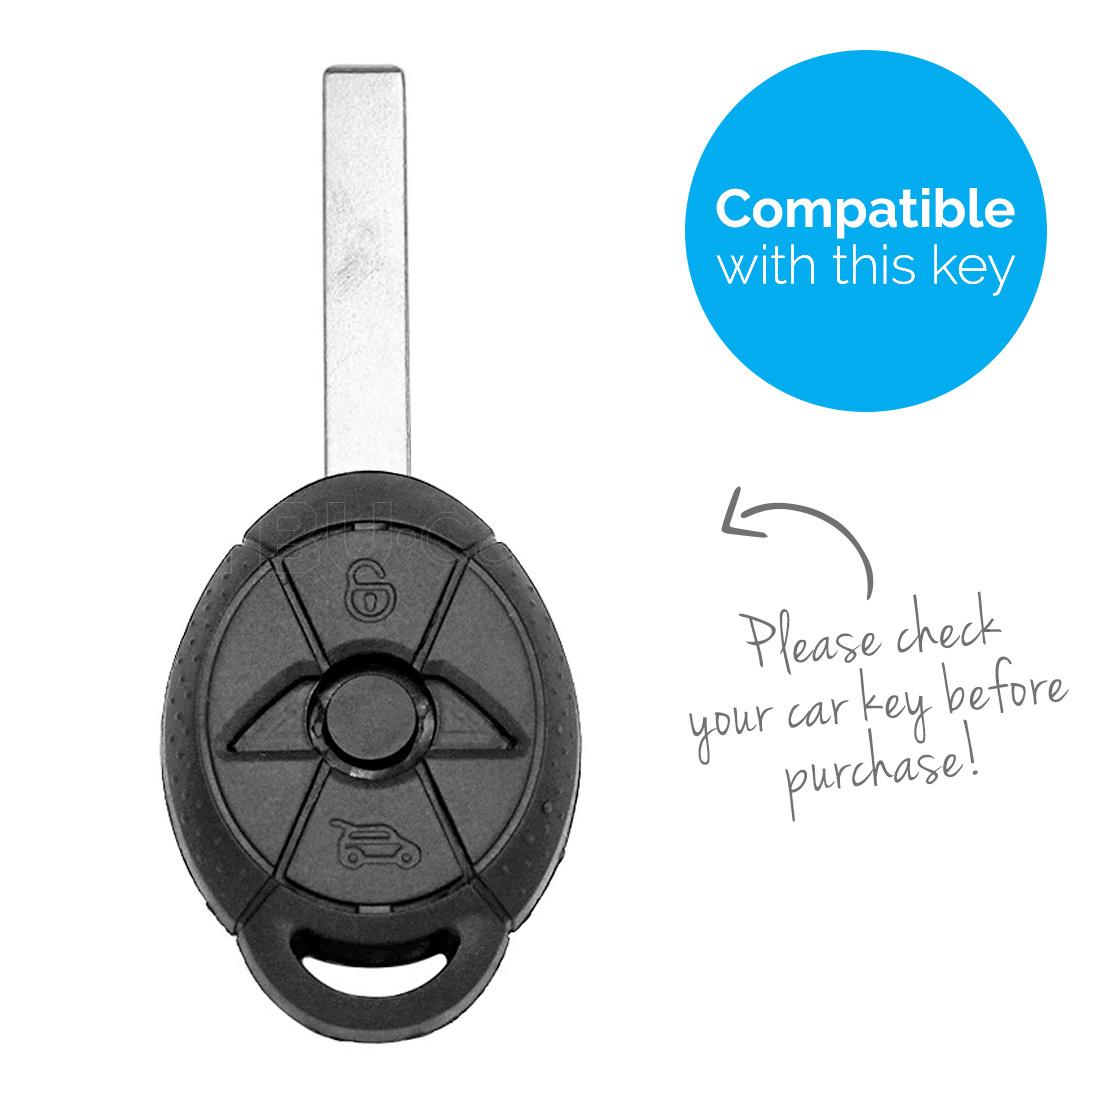 TBU car TBU car Sleutel cover compatibel met Mini - Silicone sleutelhoesje - beschermhoesje autosleutel - Roze